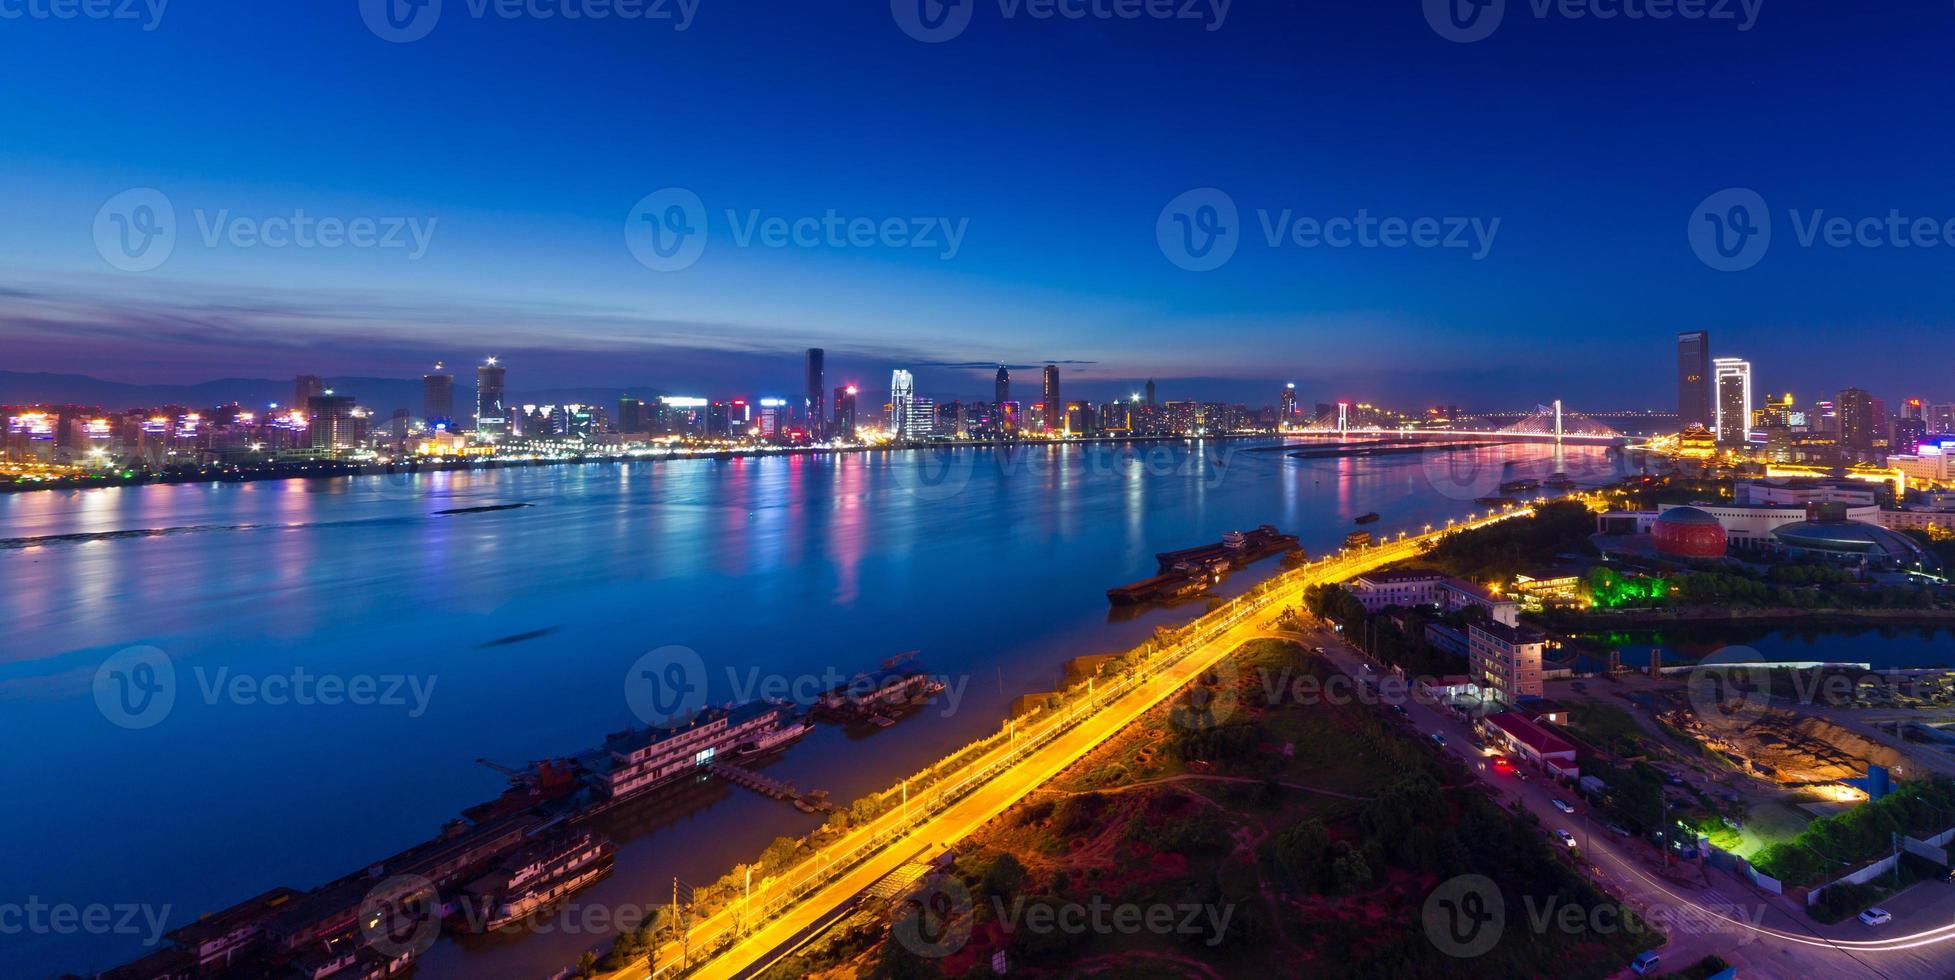 Gan river on both sides at night photo